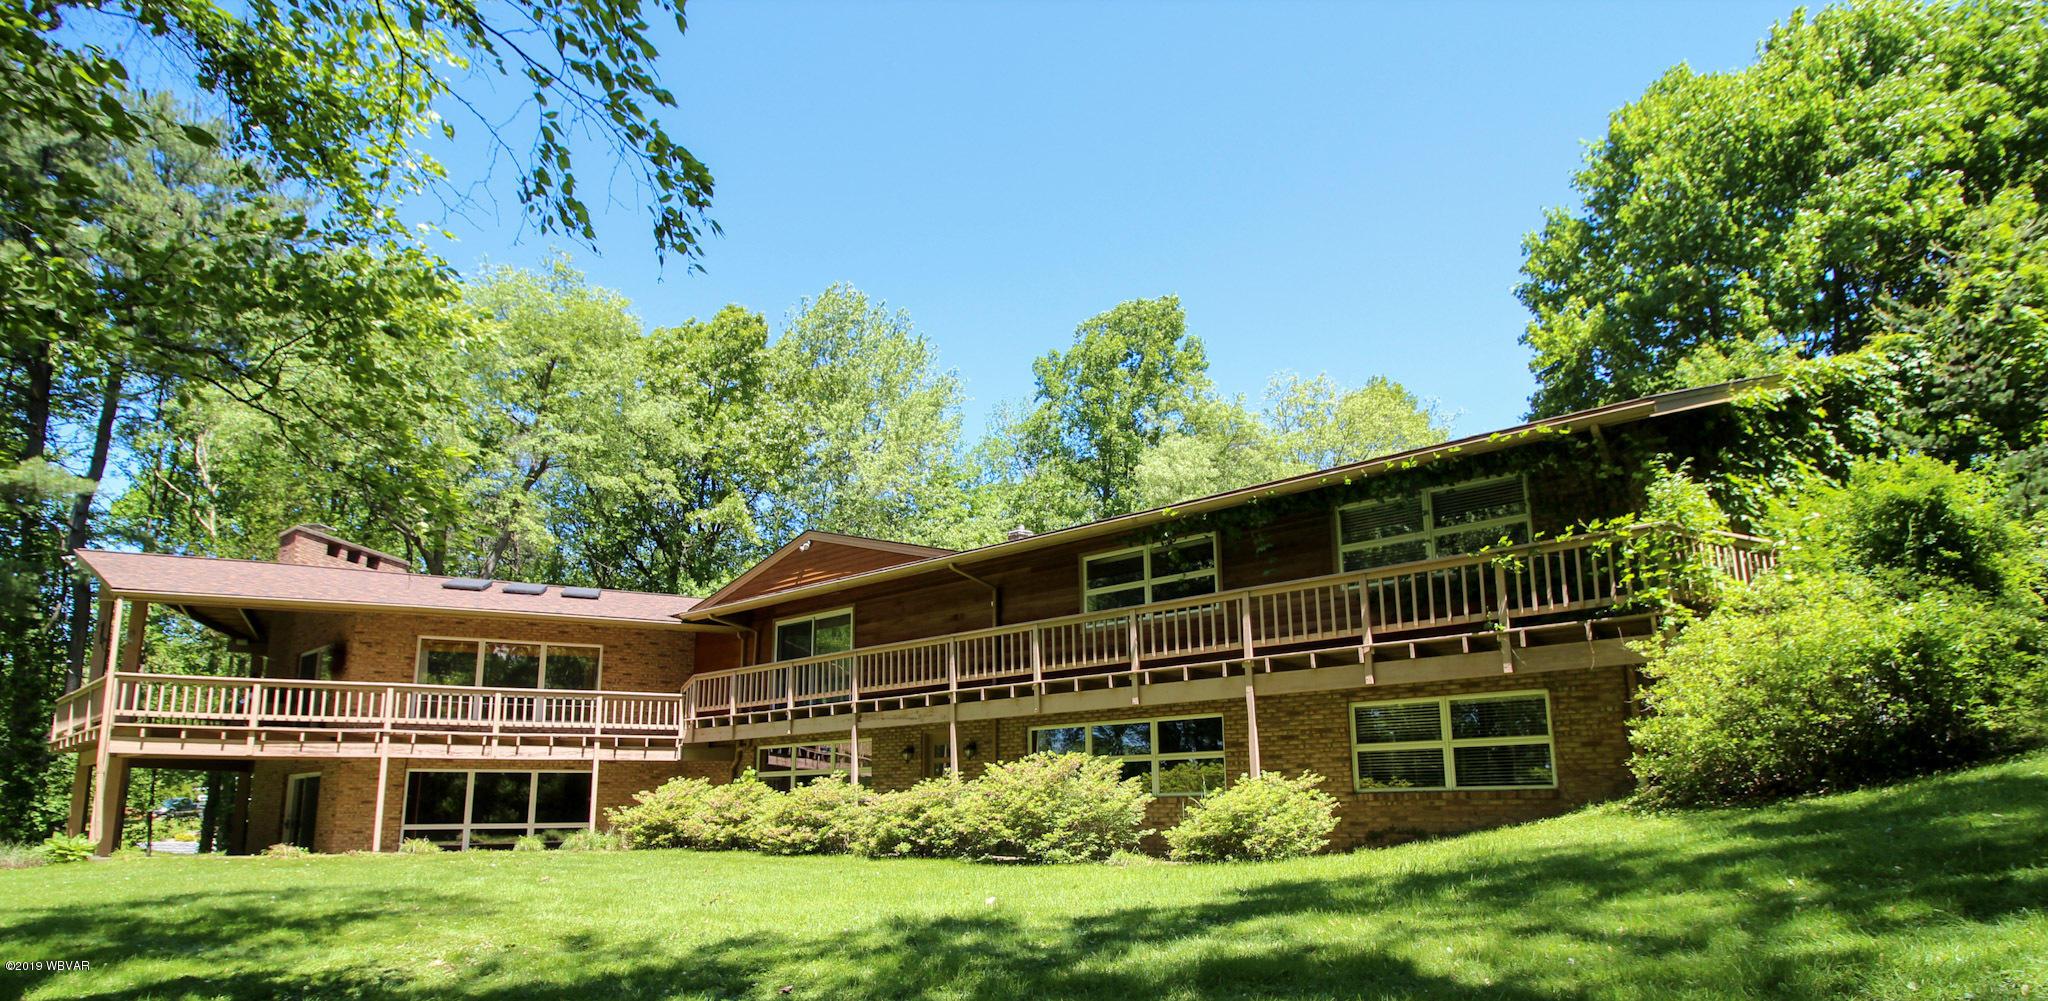 515 SAND HILL ROAD,Montoursville,PA 17754,4 Bedrooms Bedrooms,3.5 BathroomsBathrooms,Residential,SAND HILL,WB-87401